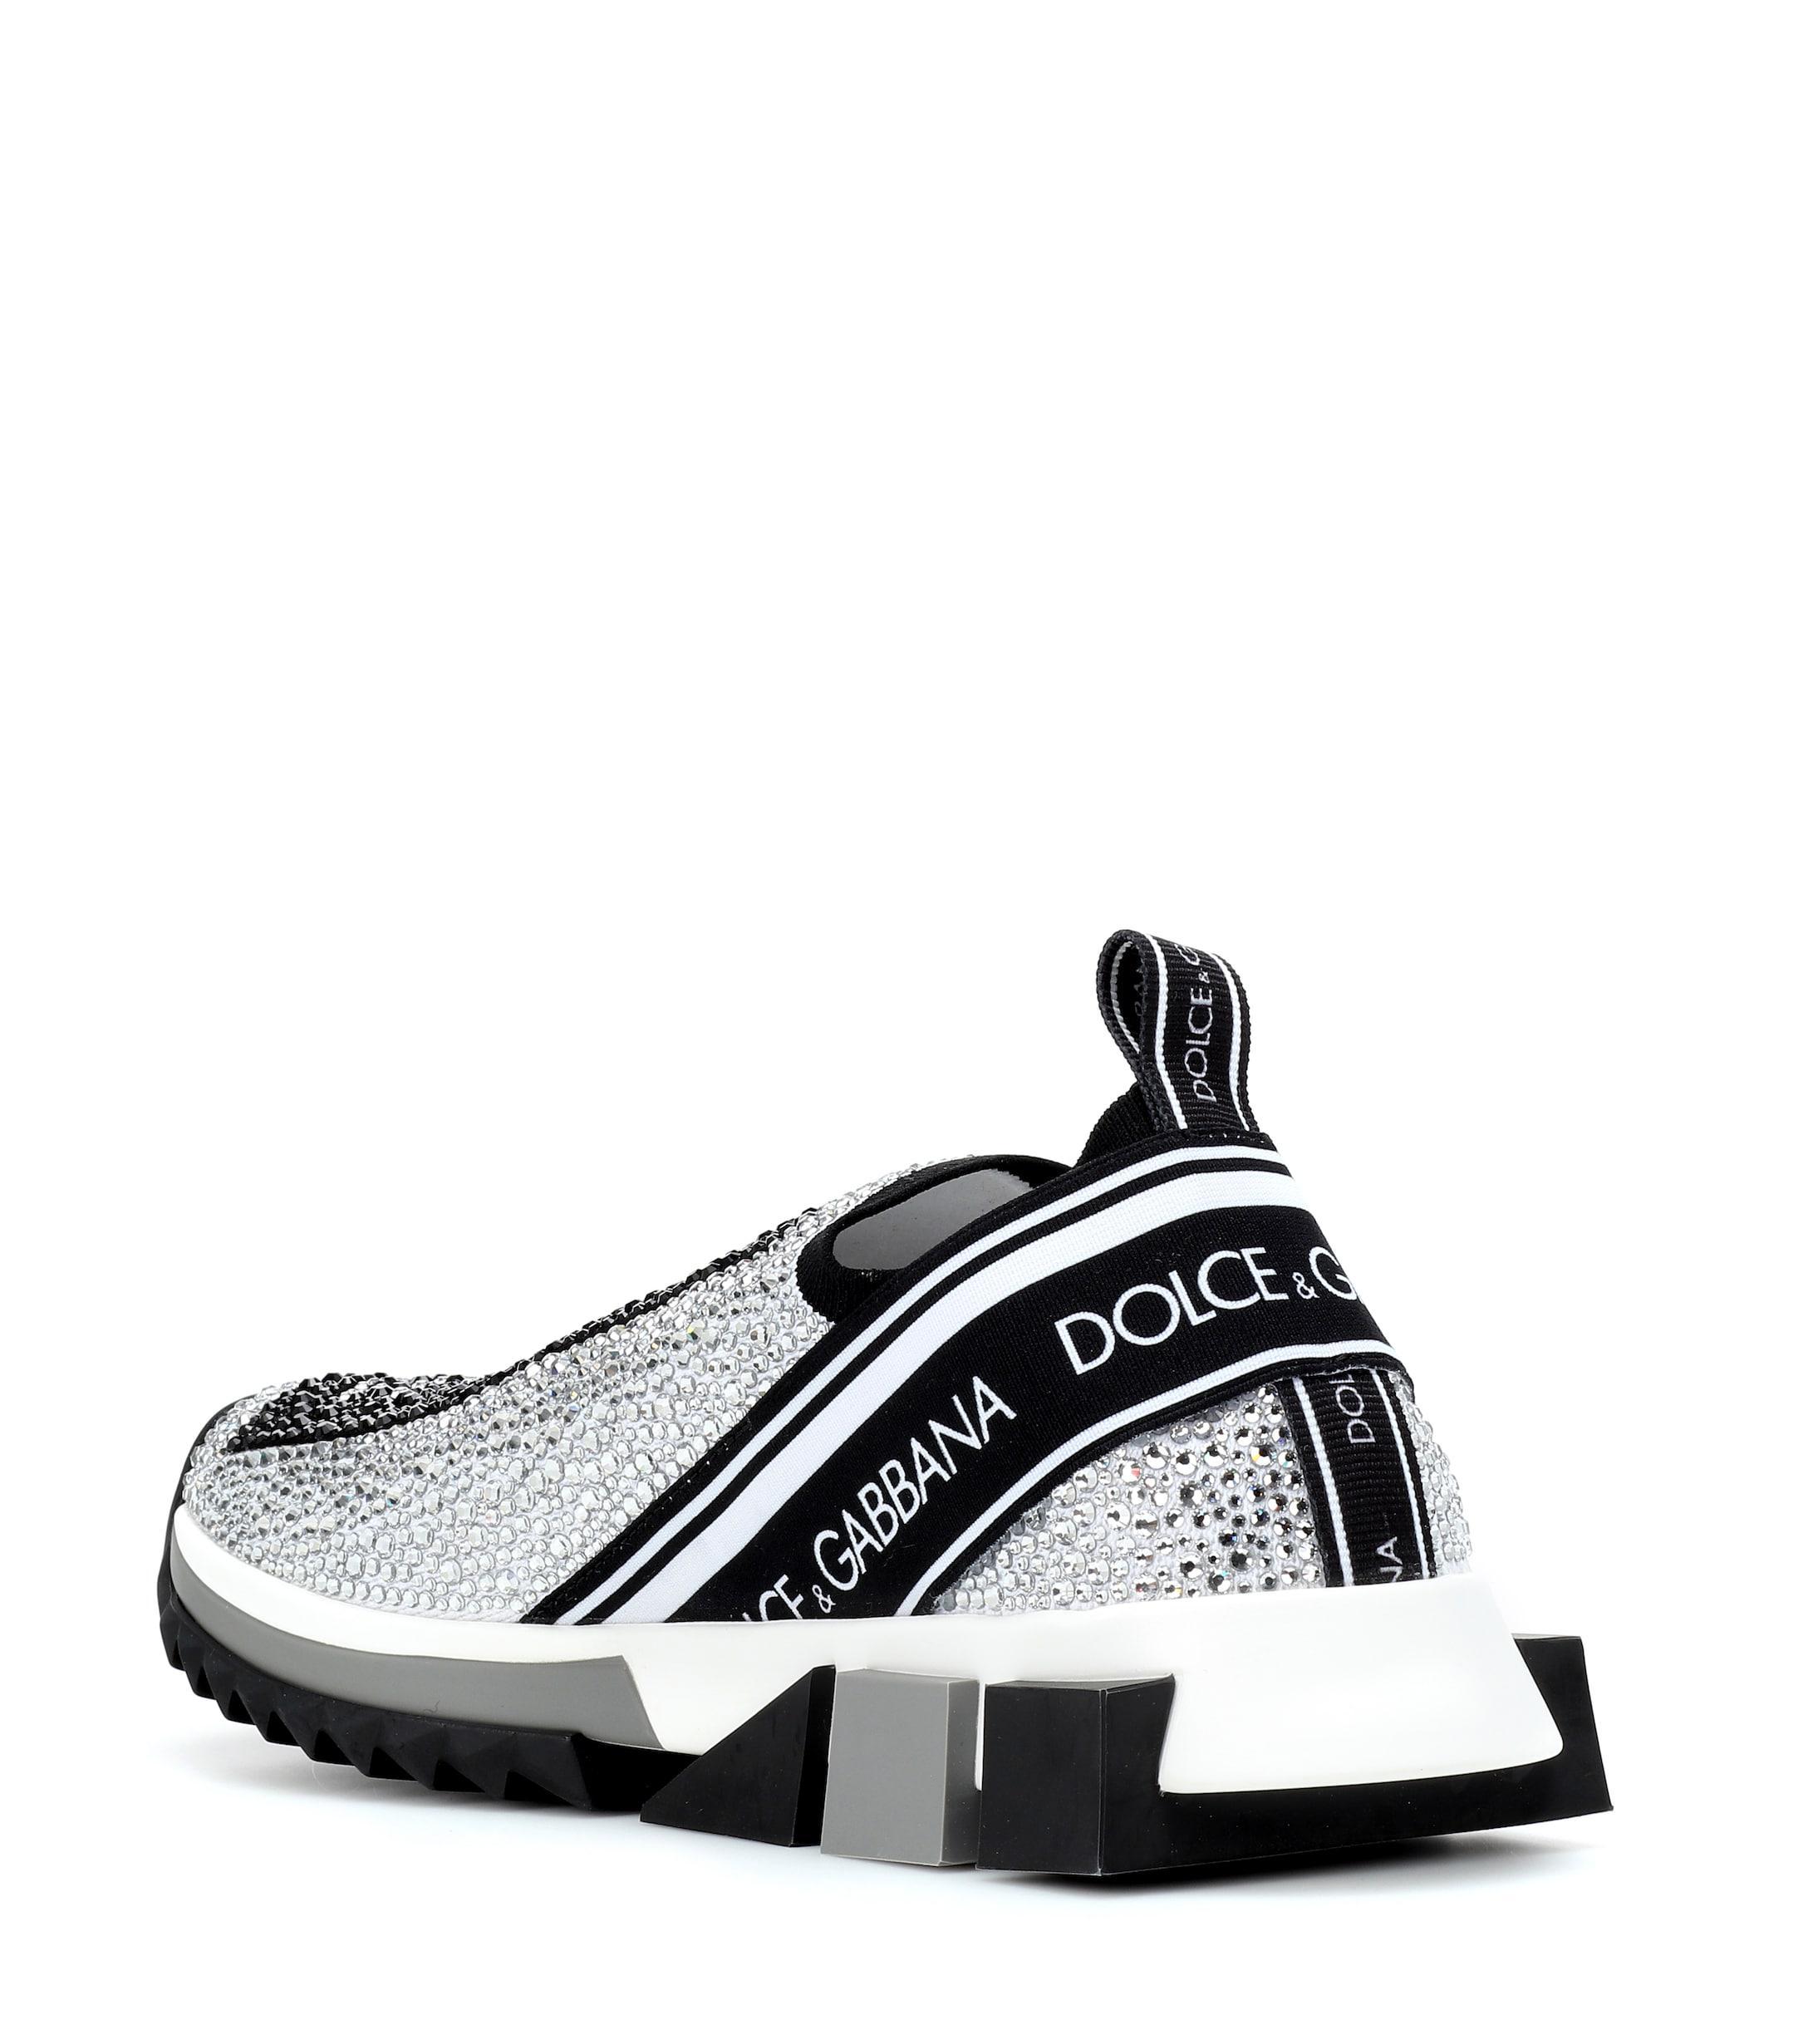 66f312642 Dolce & Gabbana - White Sorrento Embellished Sneakers - Lyst. View  fullscreen